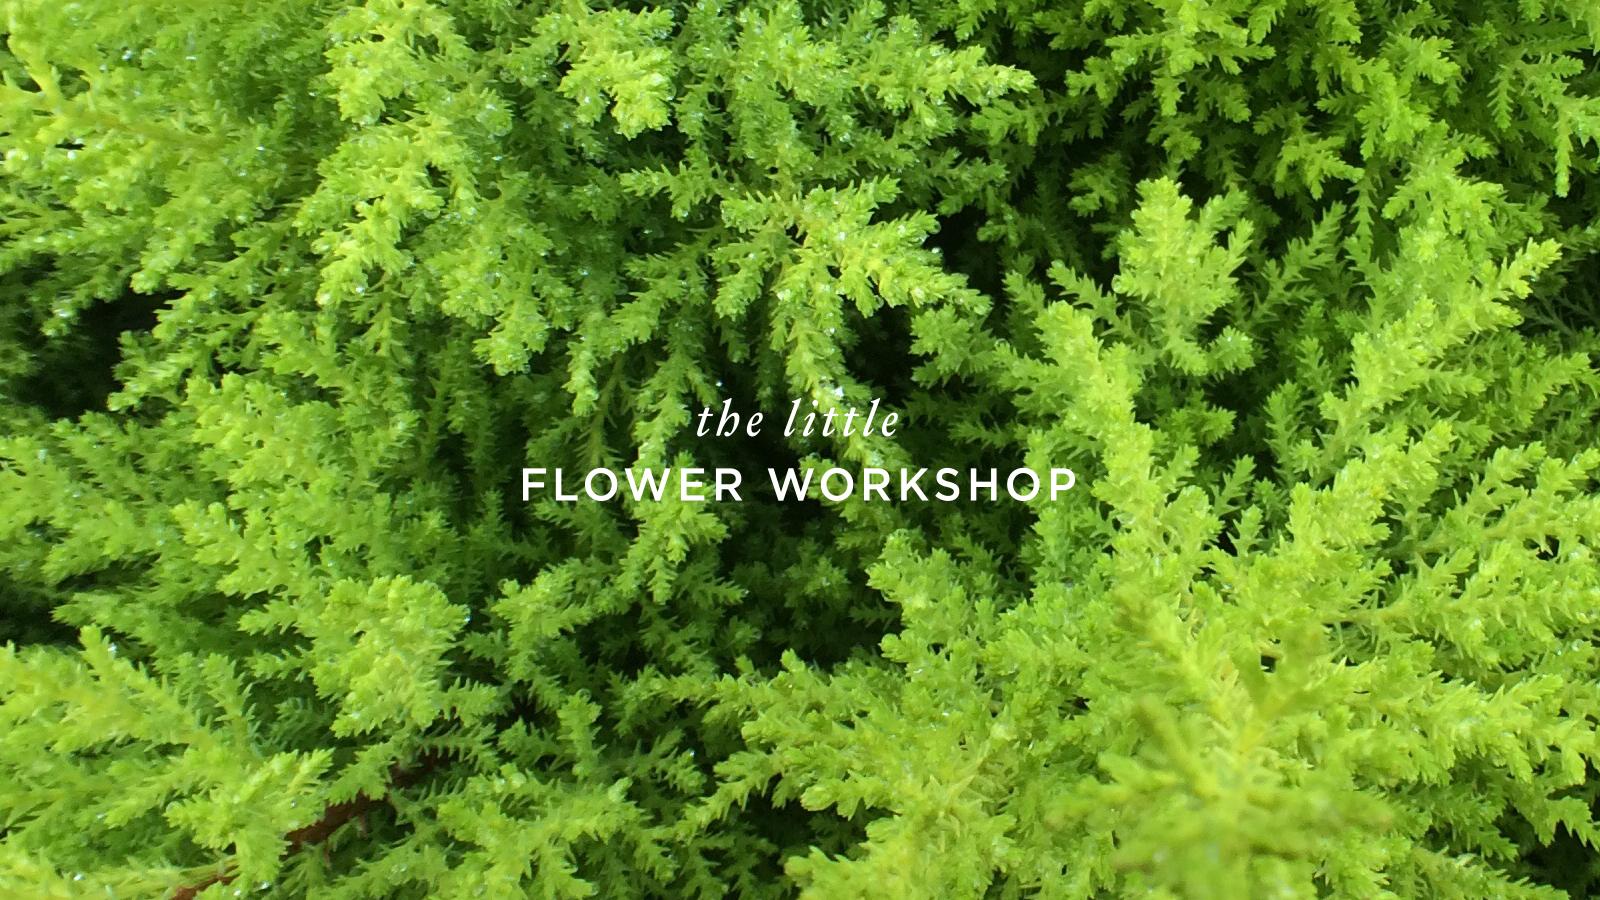 The-Little-Flower-Workshop-Logo-Designed-By-ALSO-Agency-2